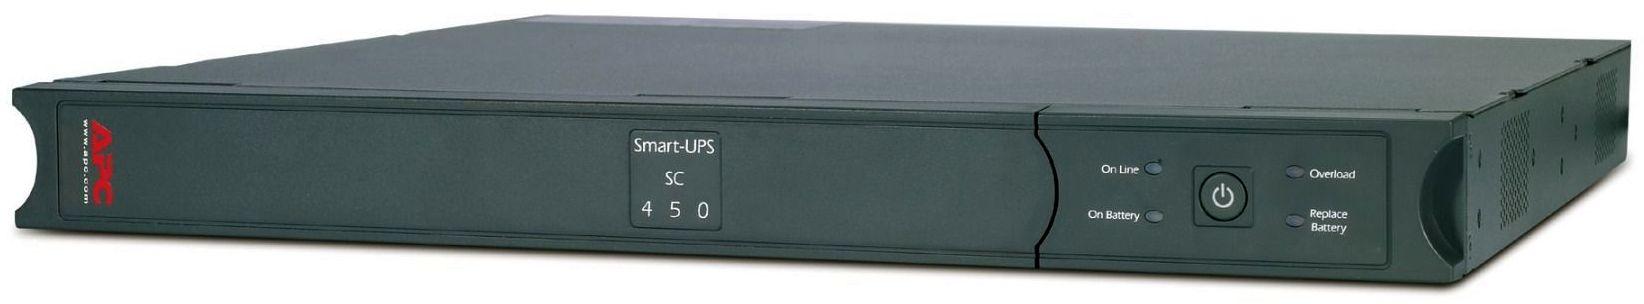 APC-by-Schneider-Electric-Smart-UPS-SC450RMI1U